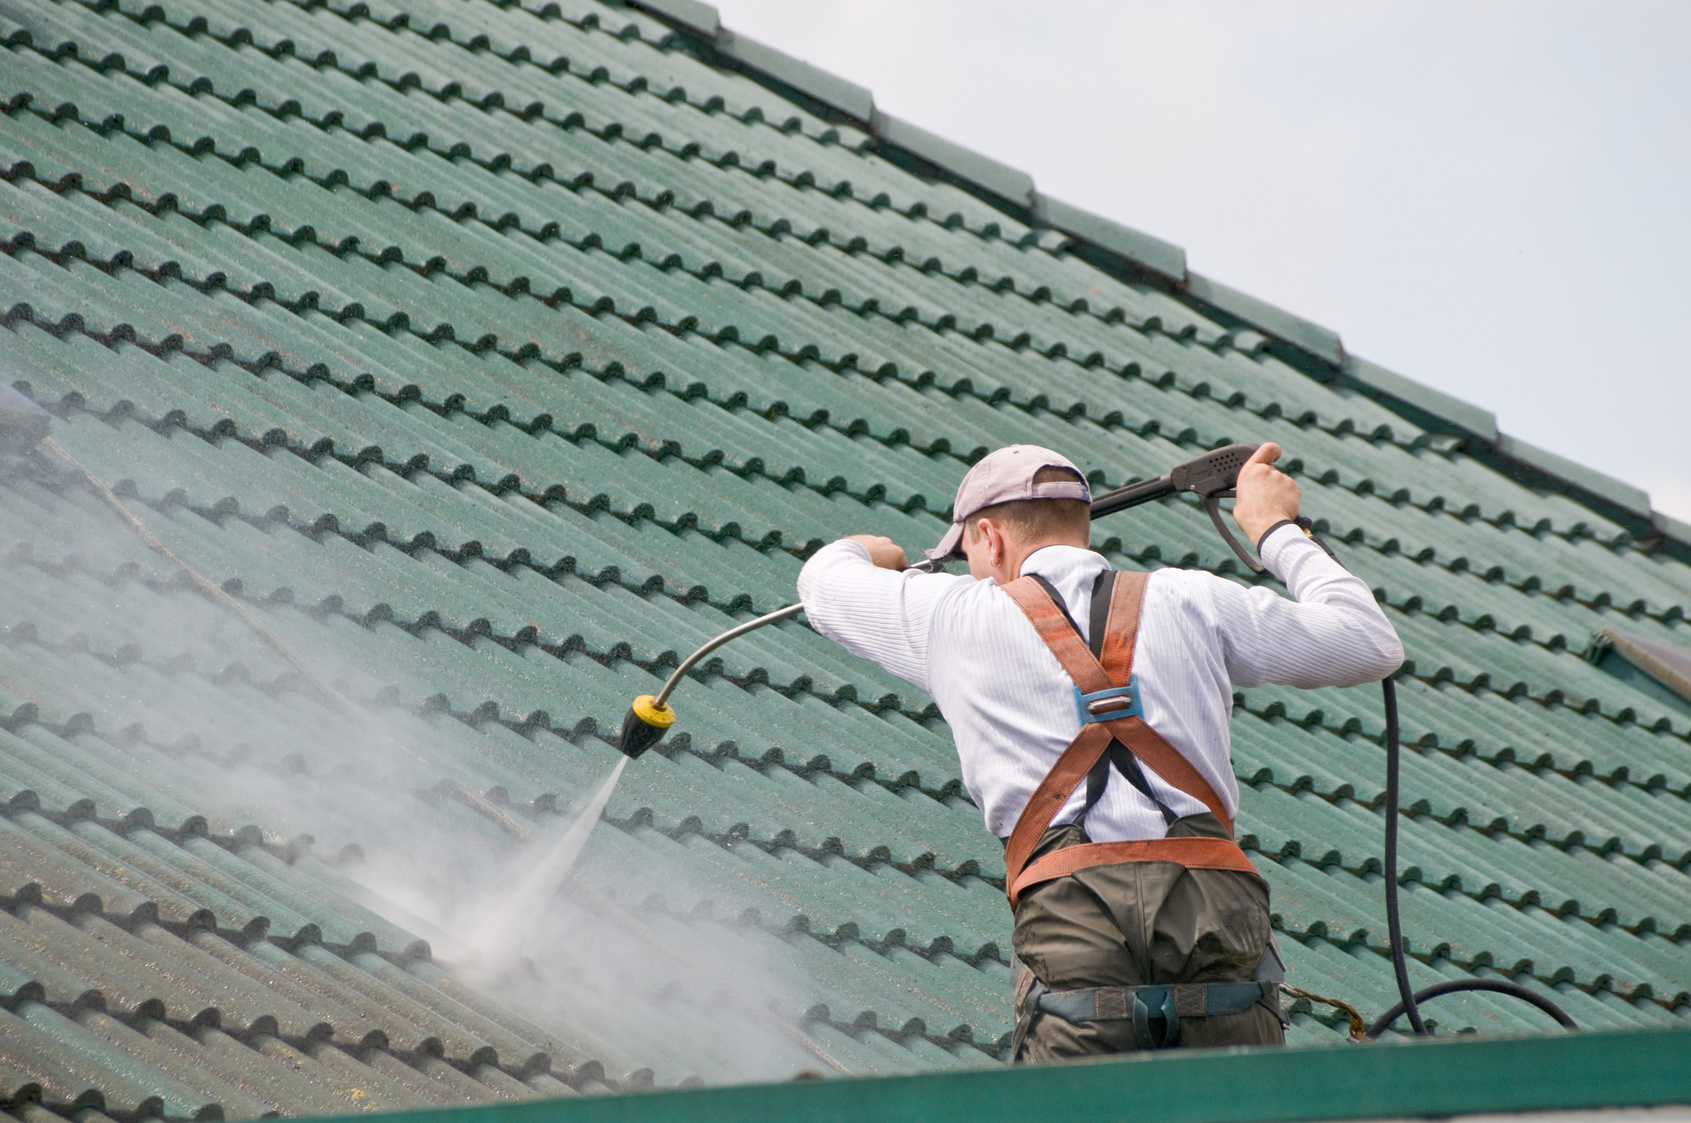 Nettoyage de toitures